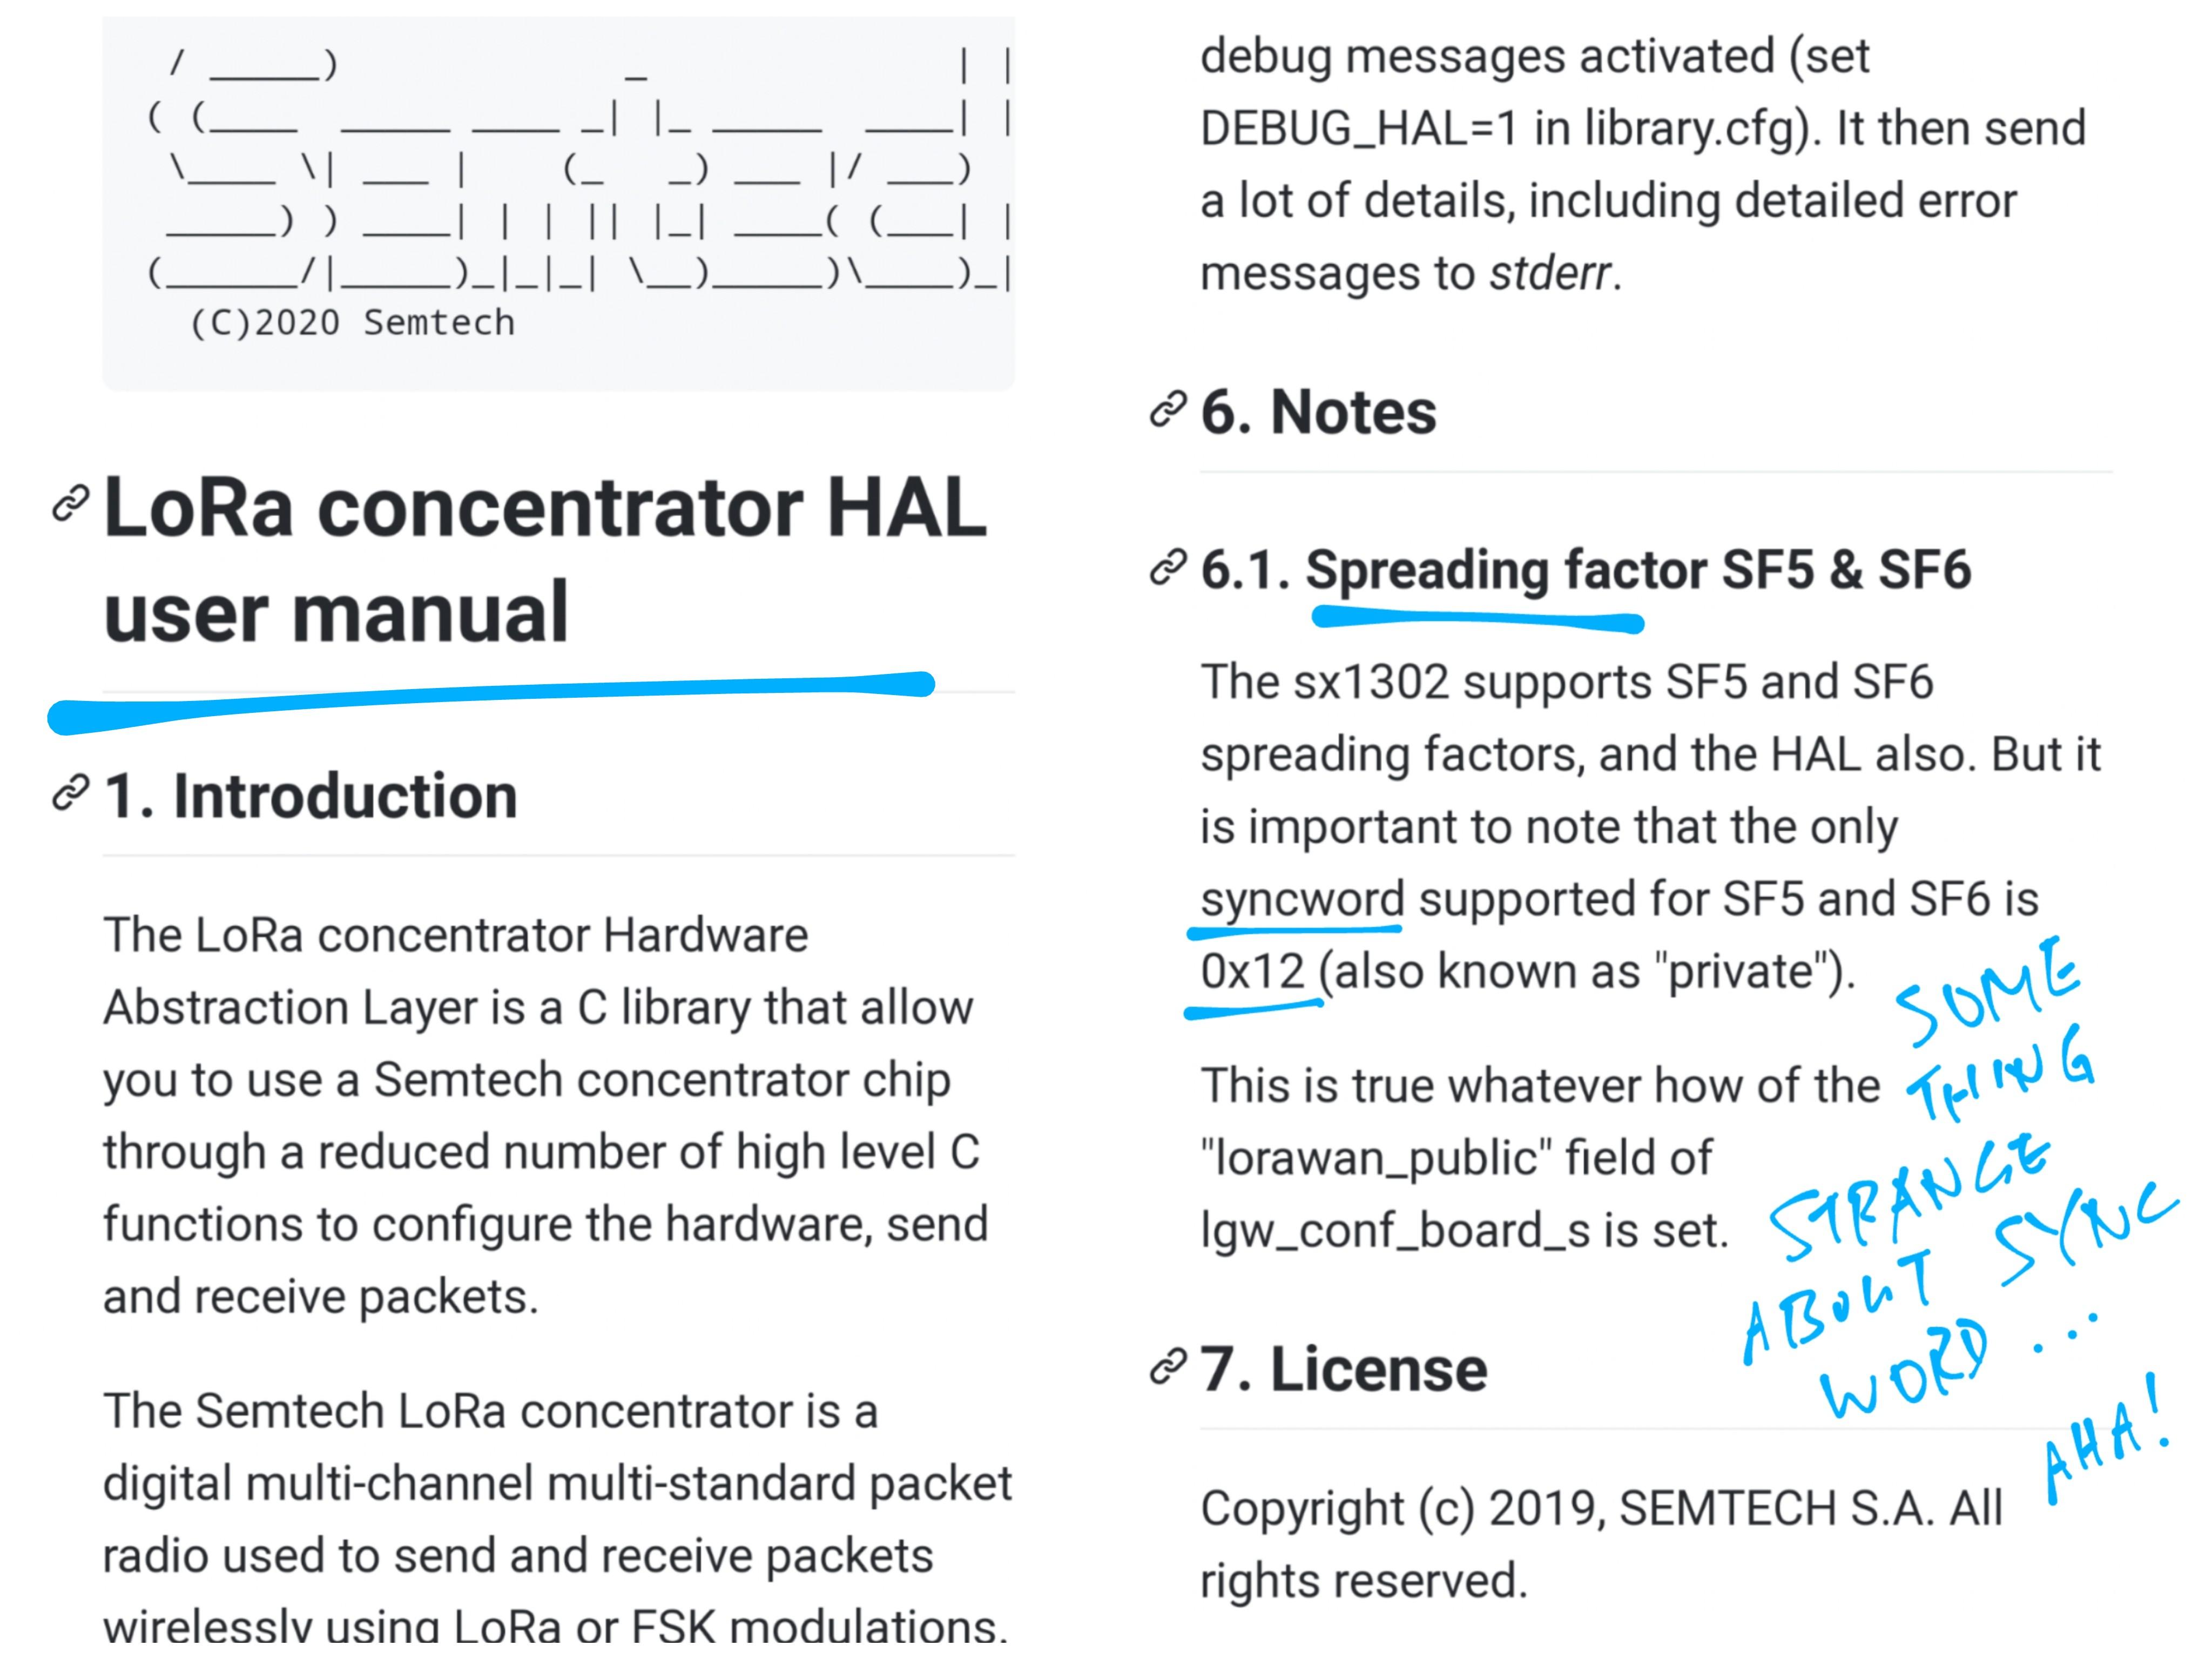 LoRa Concentrator HAL User Manual